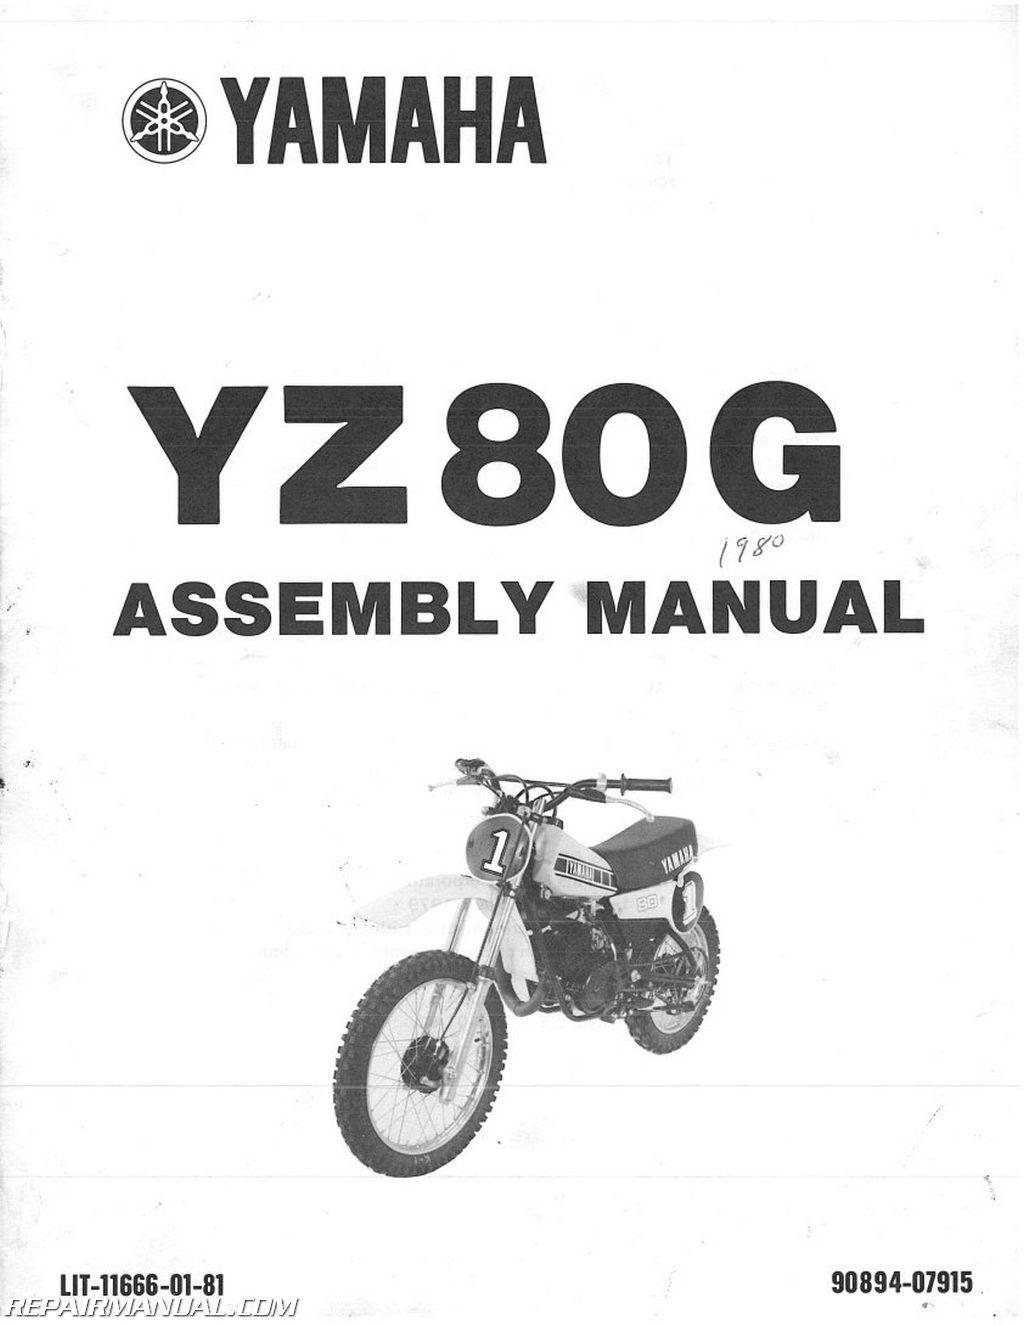 1980 Yamaha YZ80G Assembly Manual